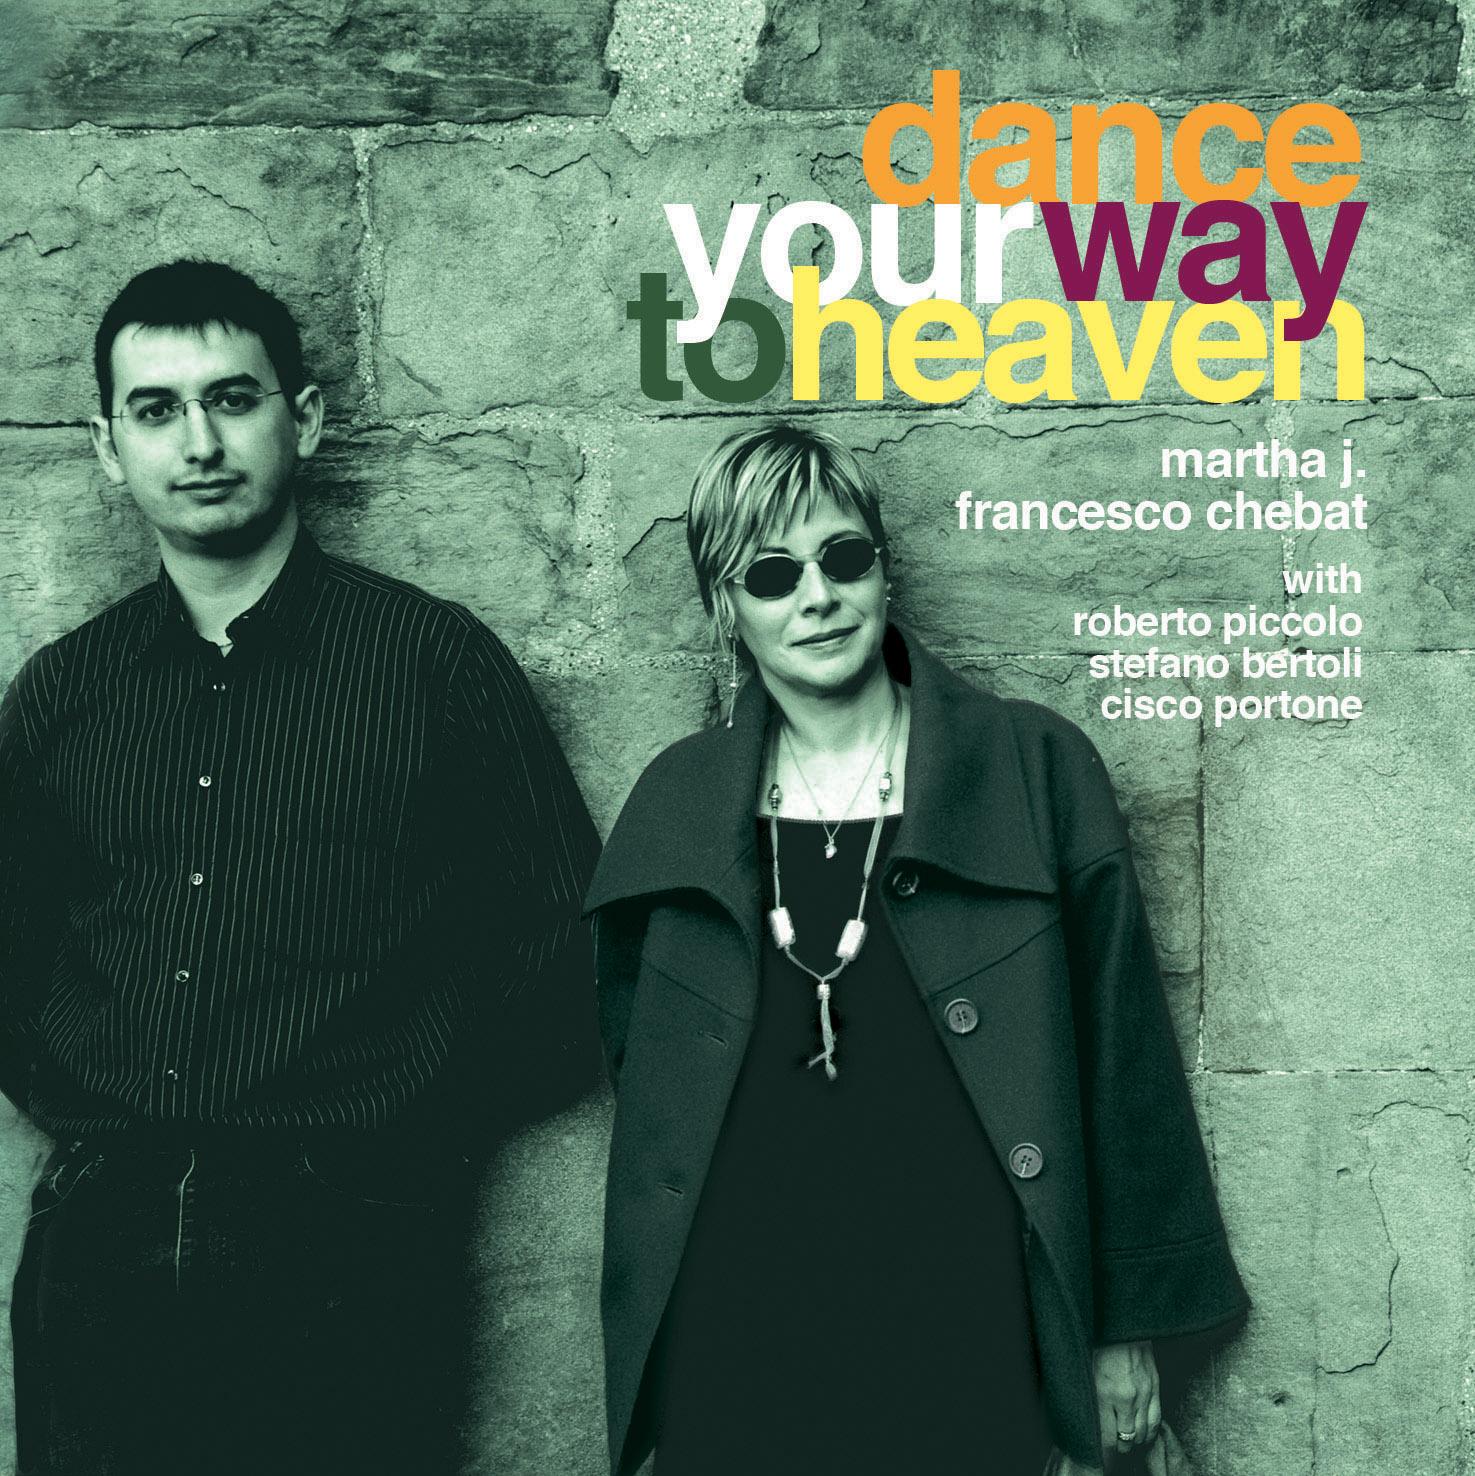 martha j and francesco chebat disco dance your way to heaven